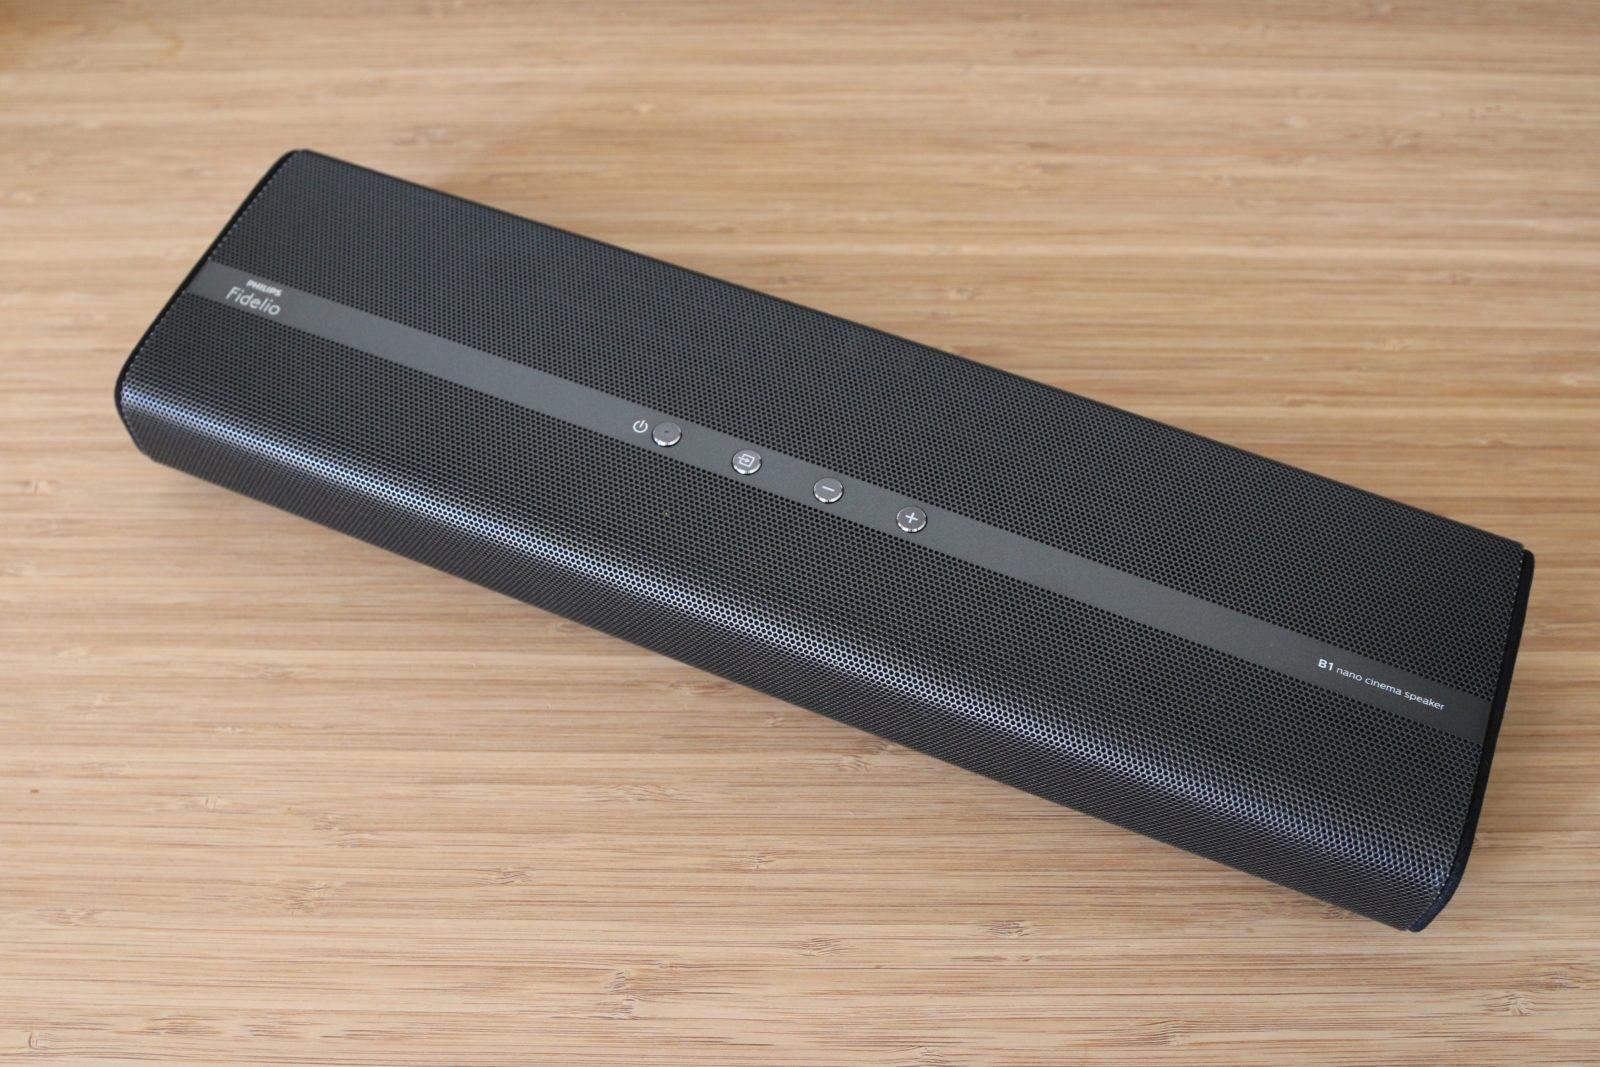 Review: Philips B1 soundbar